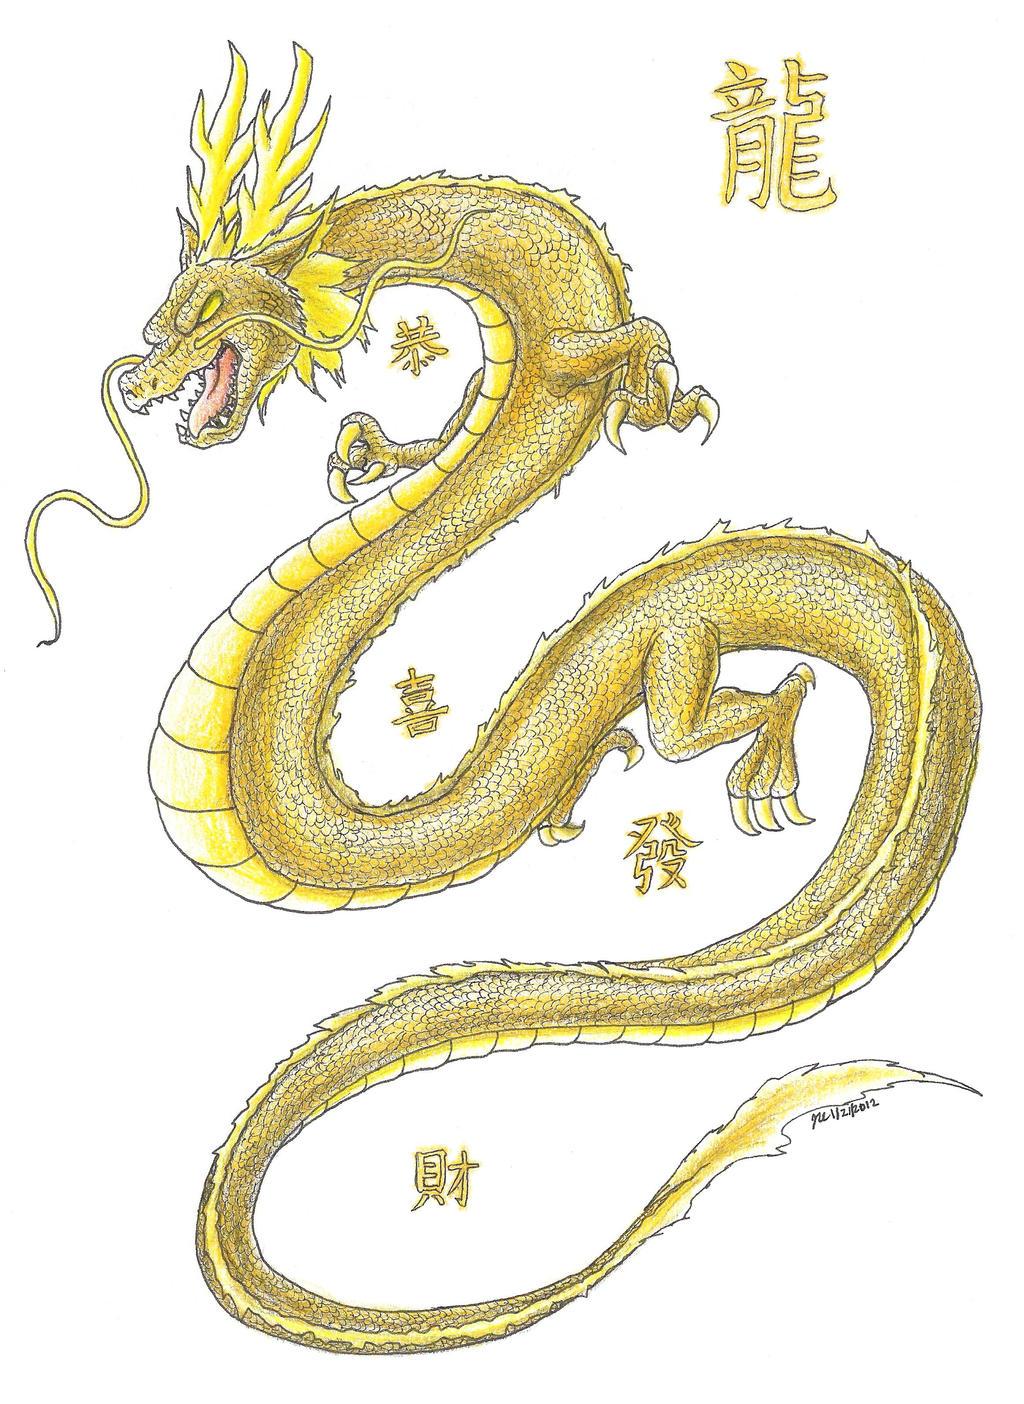 Kaishi (Dragonslayer des Lichtes 1. Generation/ Yuu's 2.Char) Dragon_2012_by_mongaikan_ryu-d4n6045